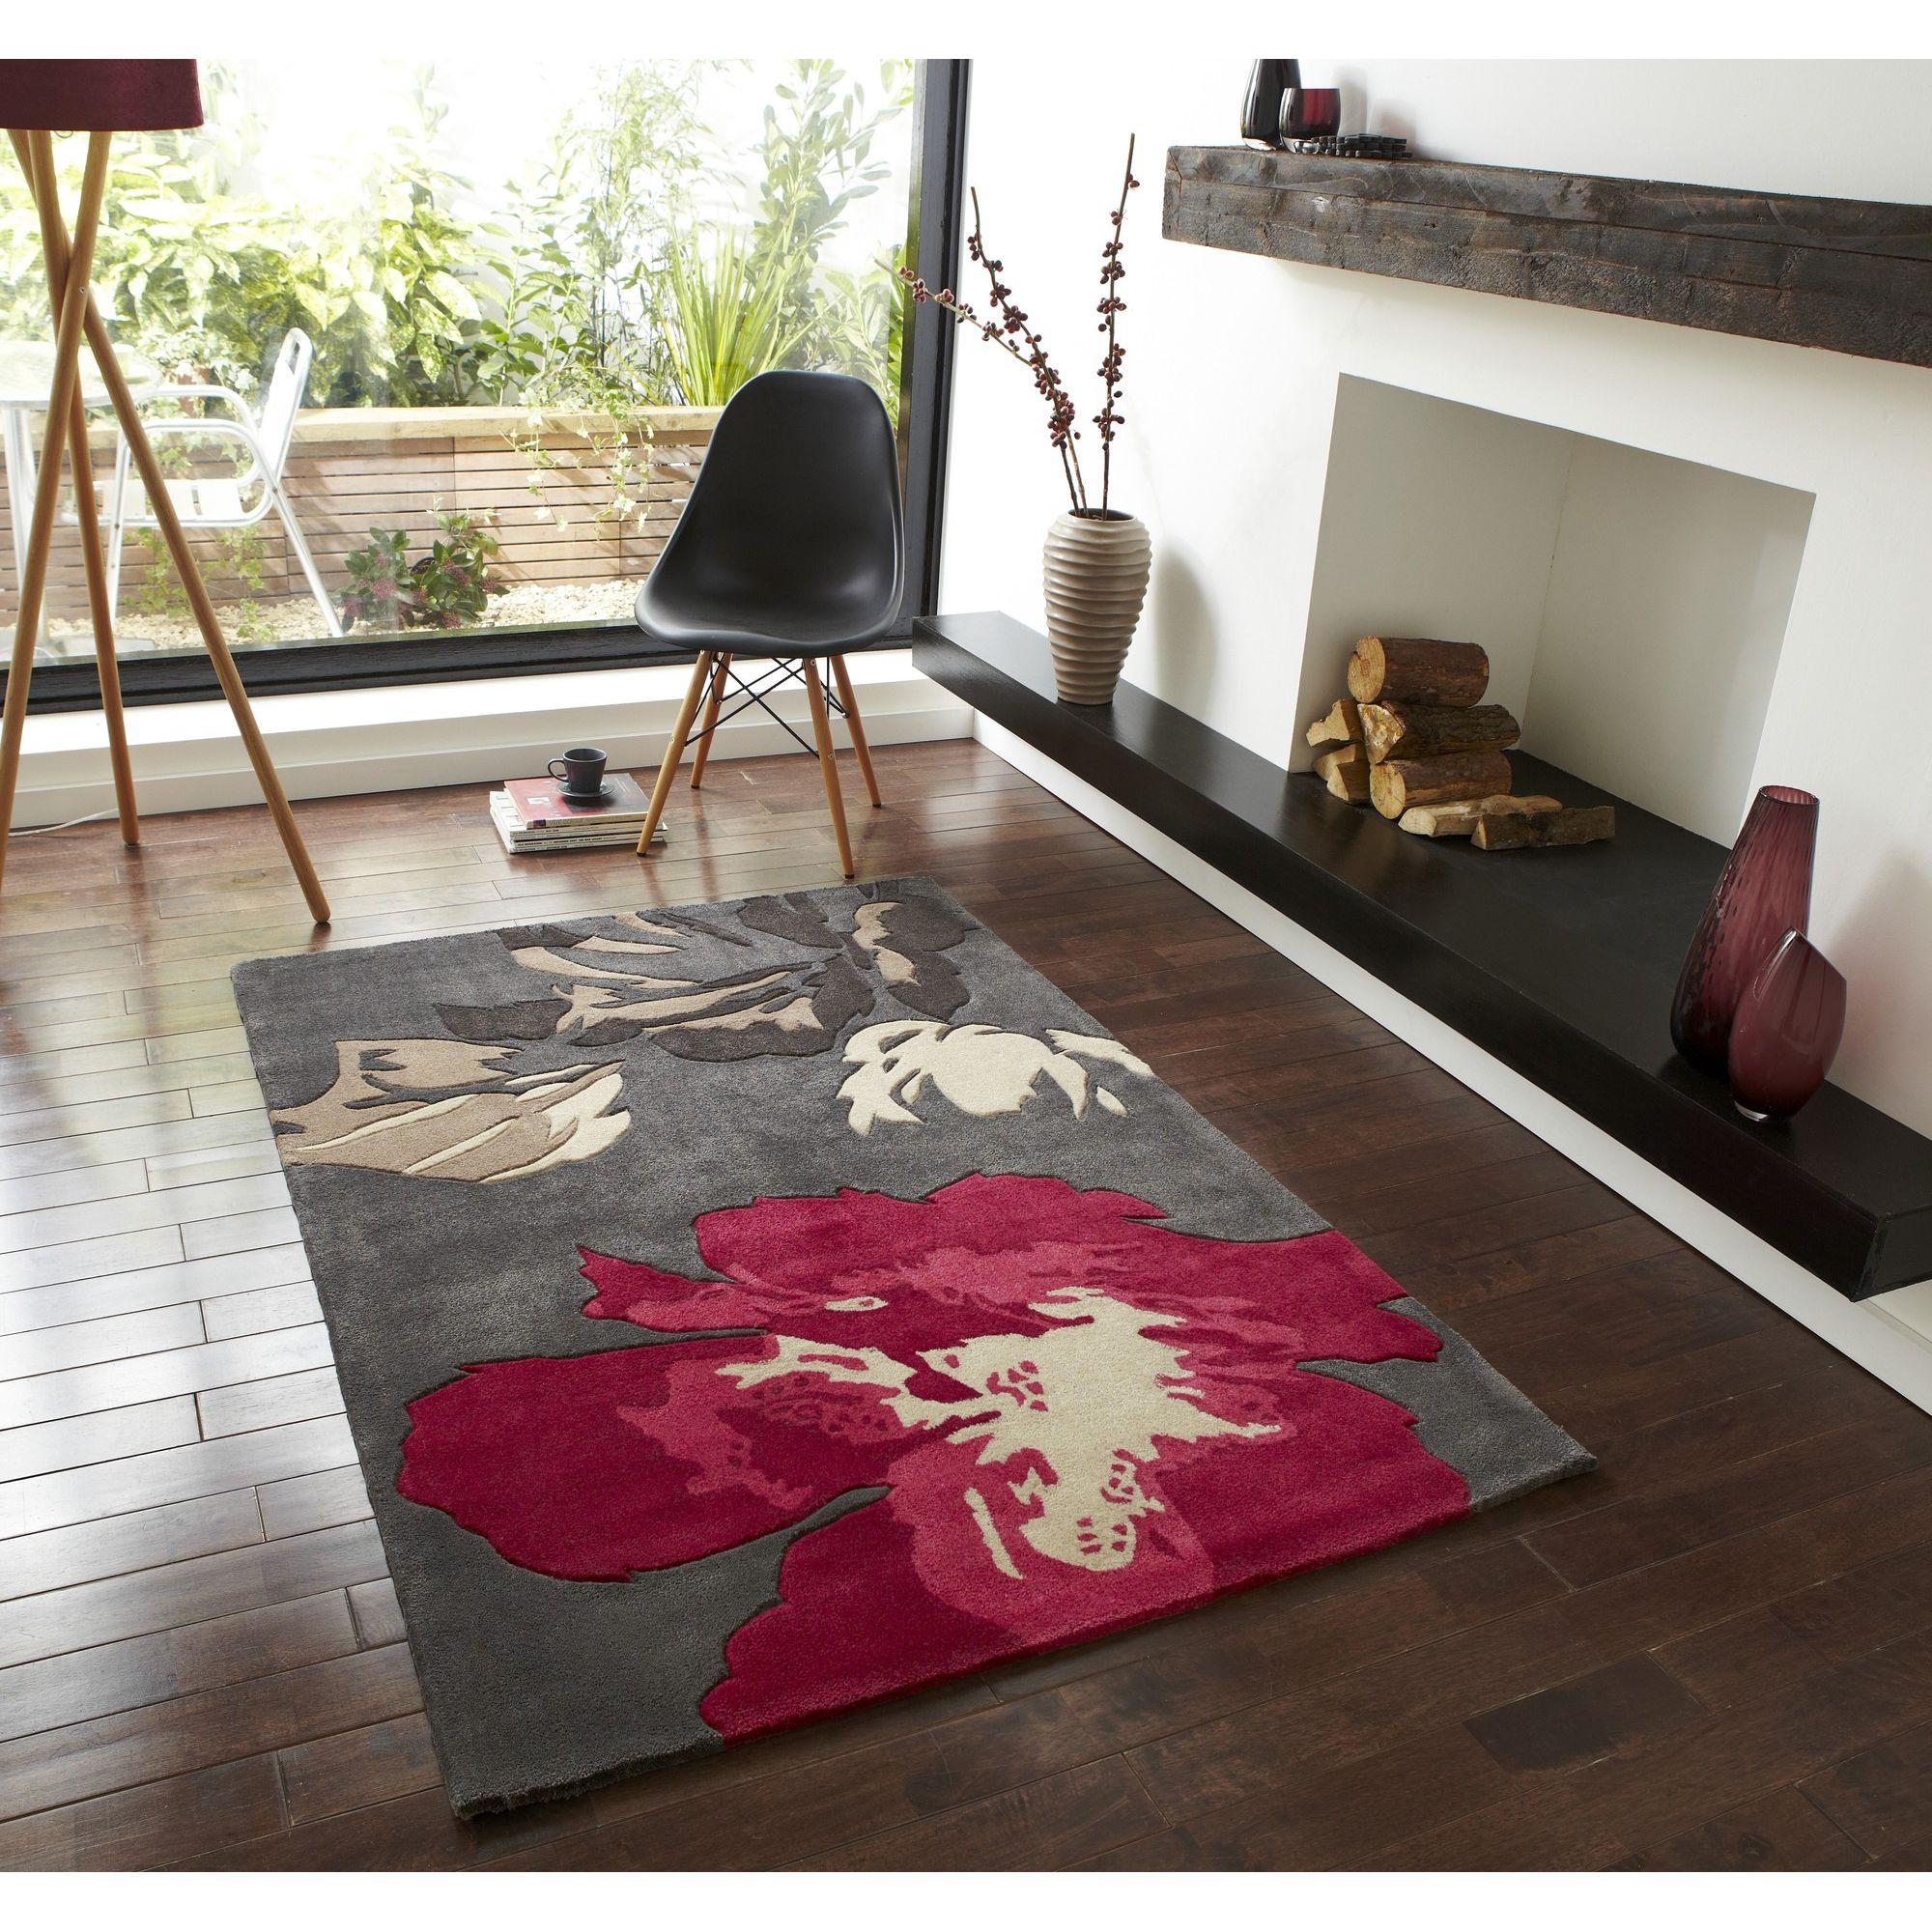 Oriental Carpets & Rugs Hong Kong 2827 Grey/Pink Rug - 150cm x 230cm